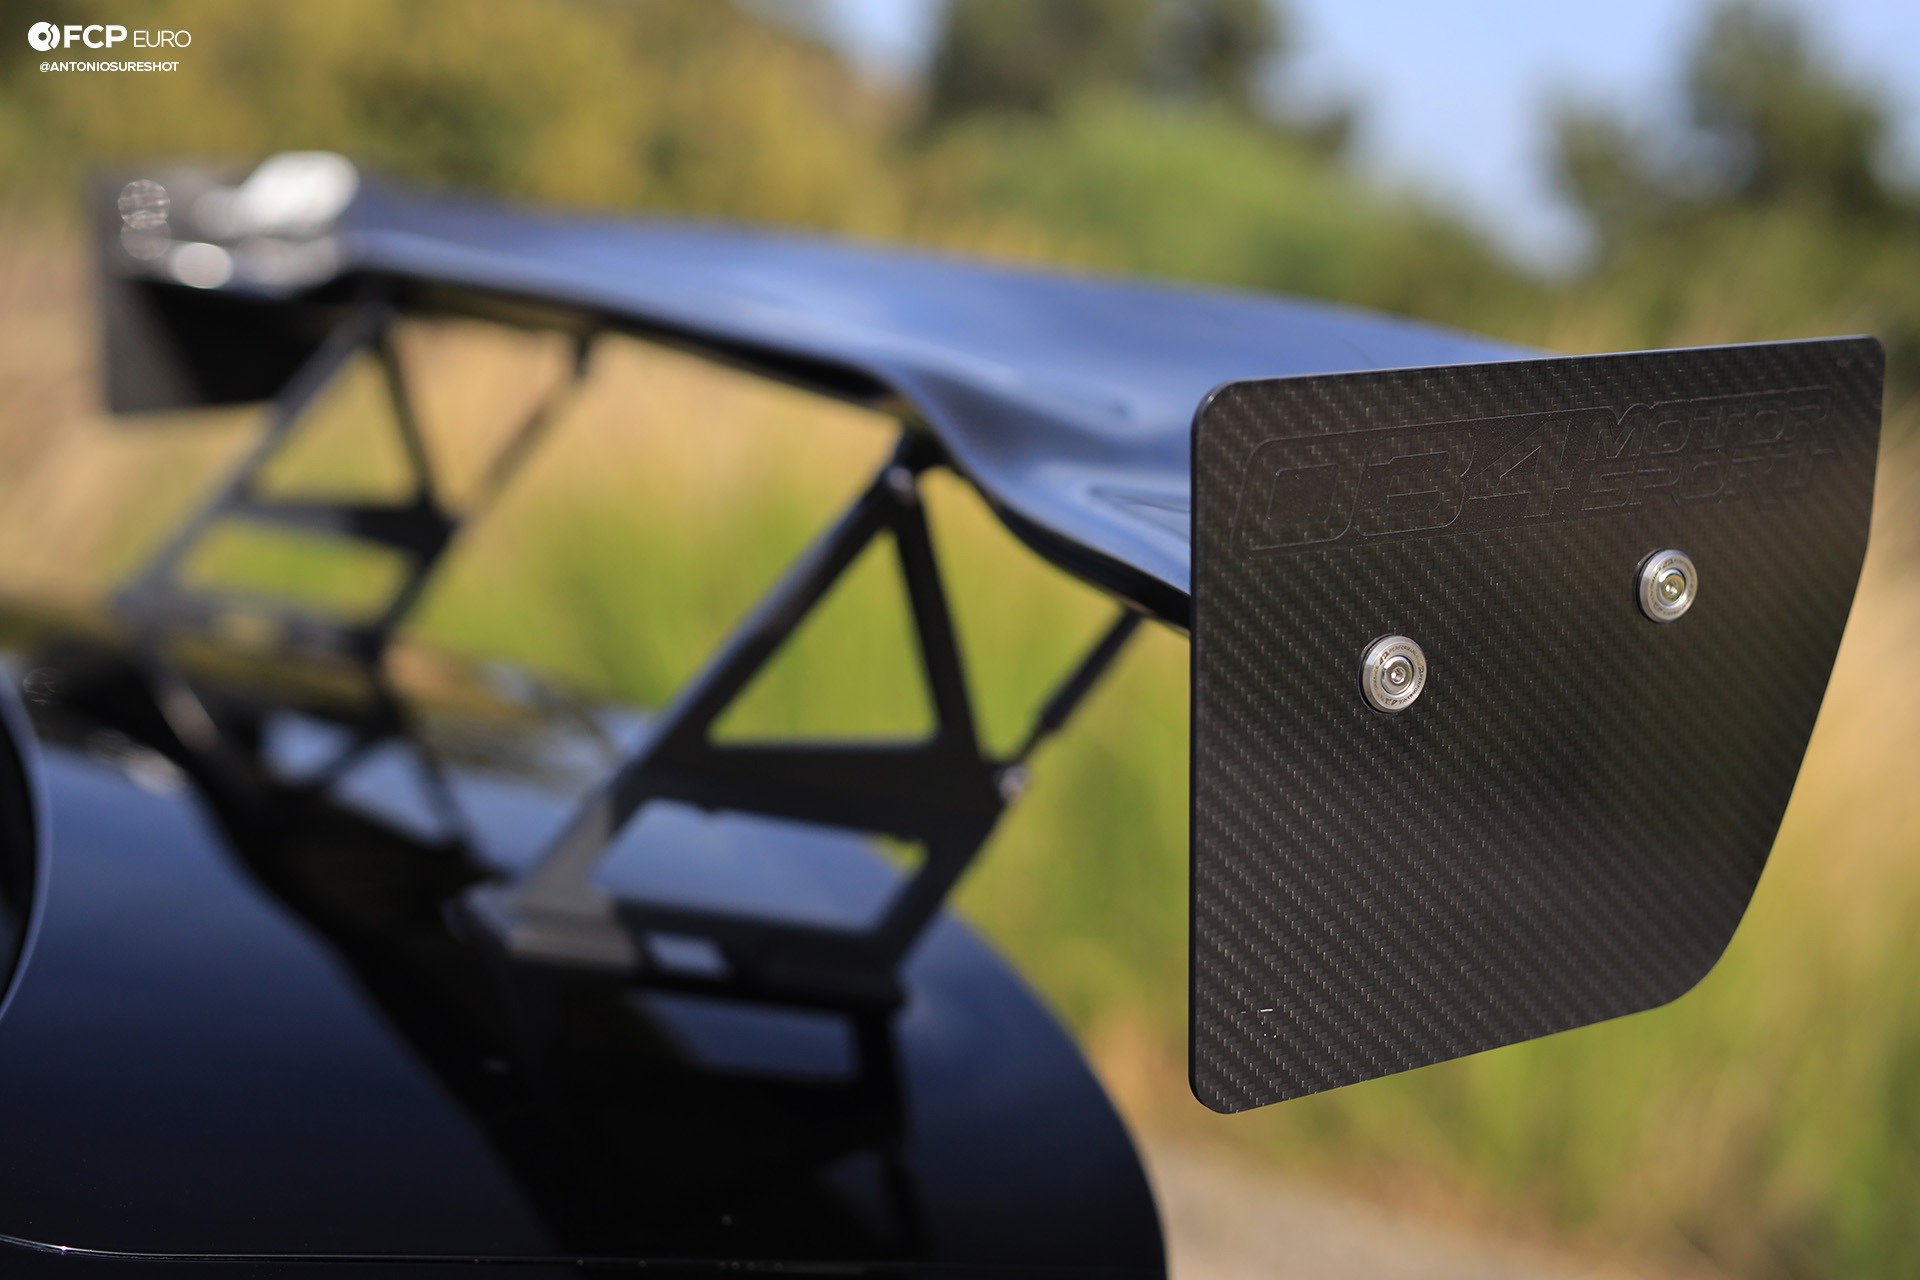 034 Motorsport Moss Motorsport B9 Audi A4 6spd Manual EOSR0895